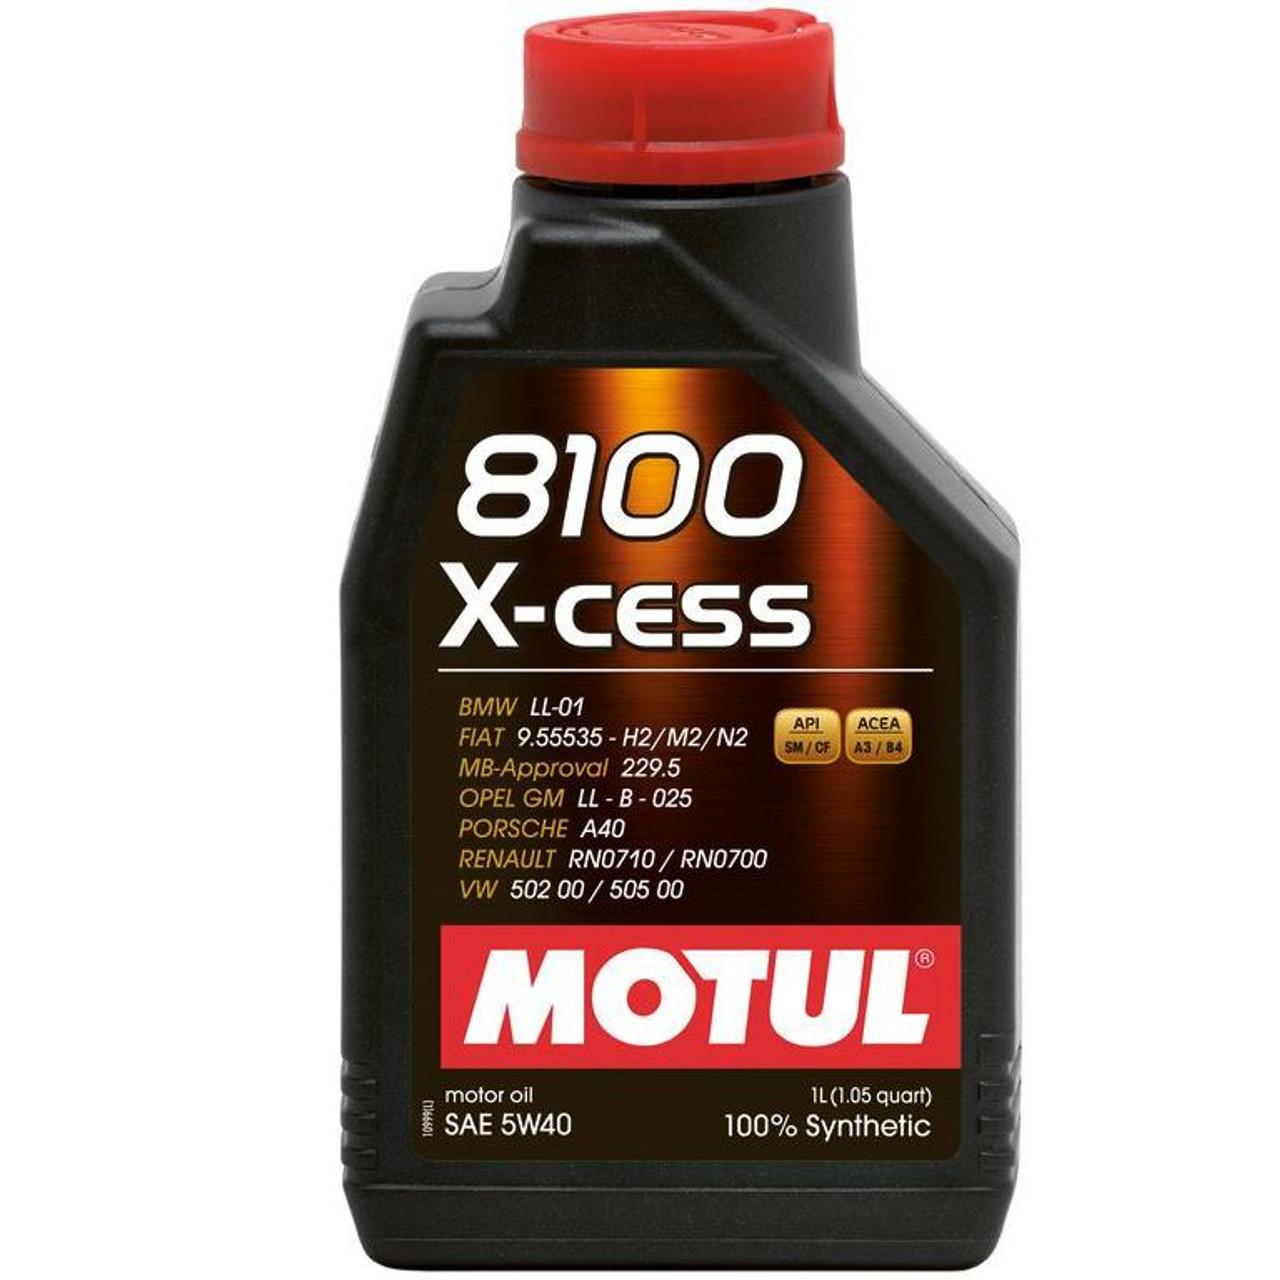 MOTUL 5w30 8100 Series Eco-Nergy Oil - 1L Bottle (1.05 qt)